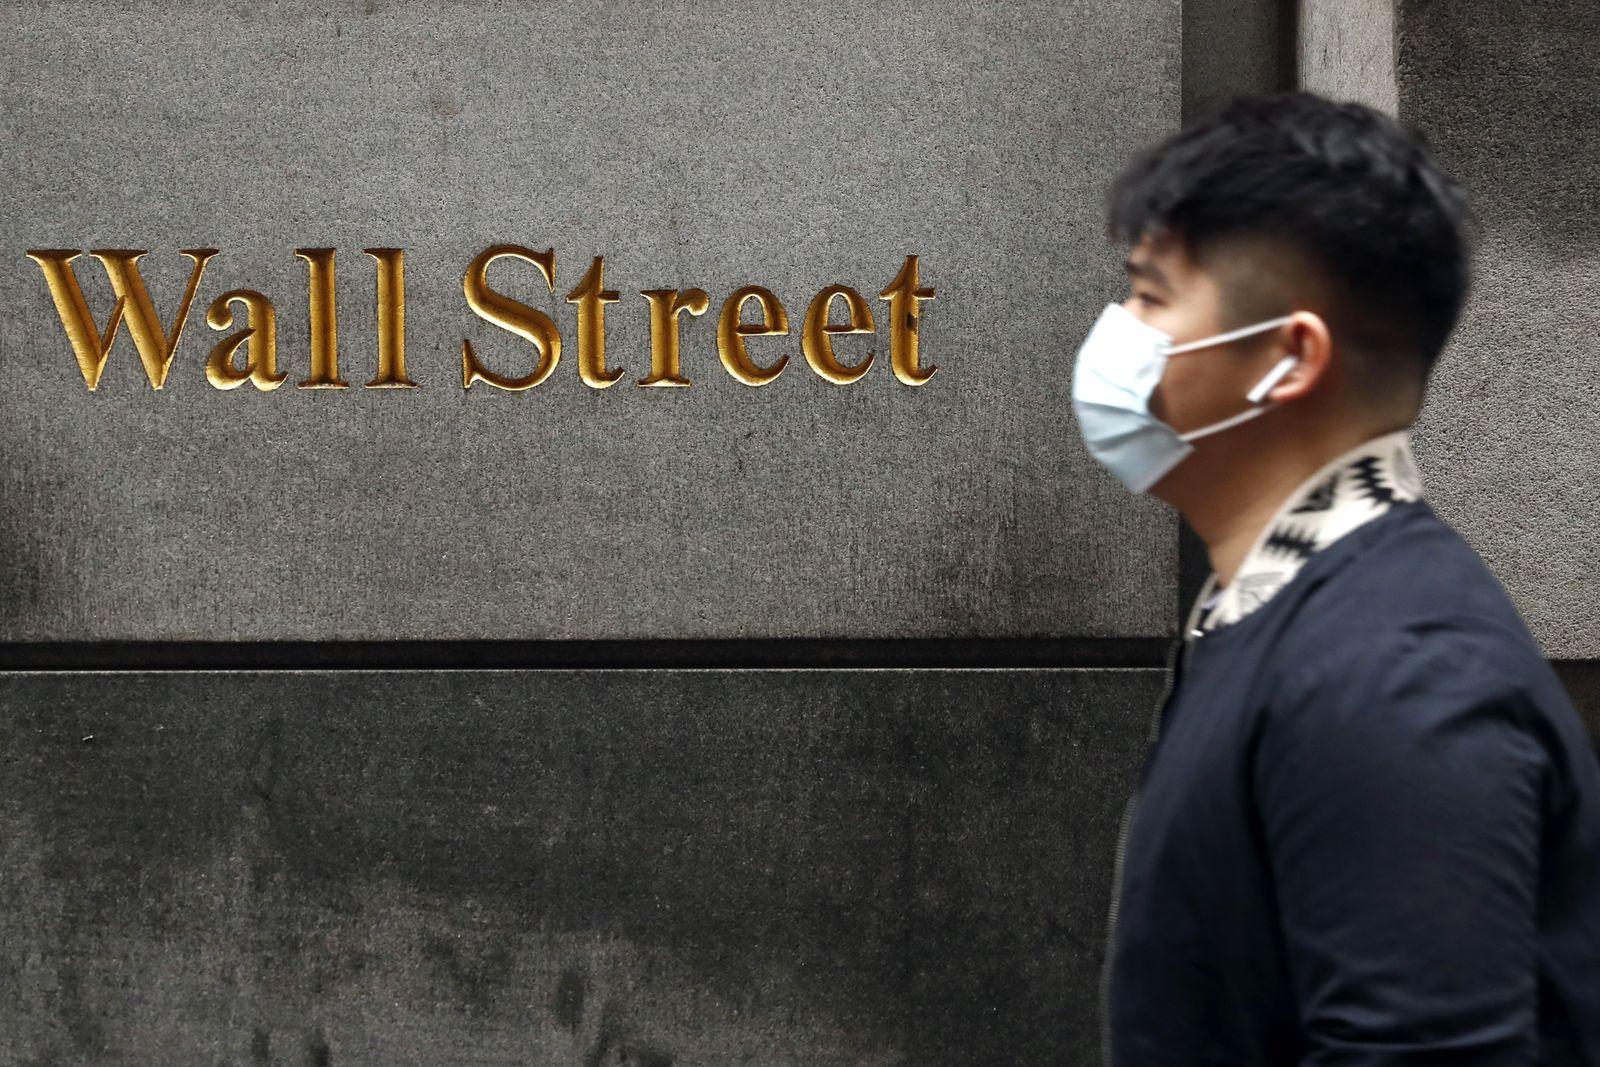 Wall Street / Corona